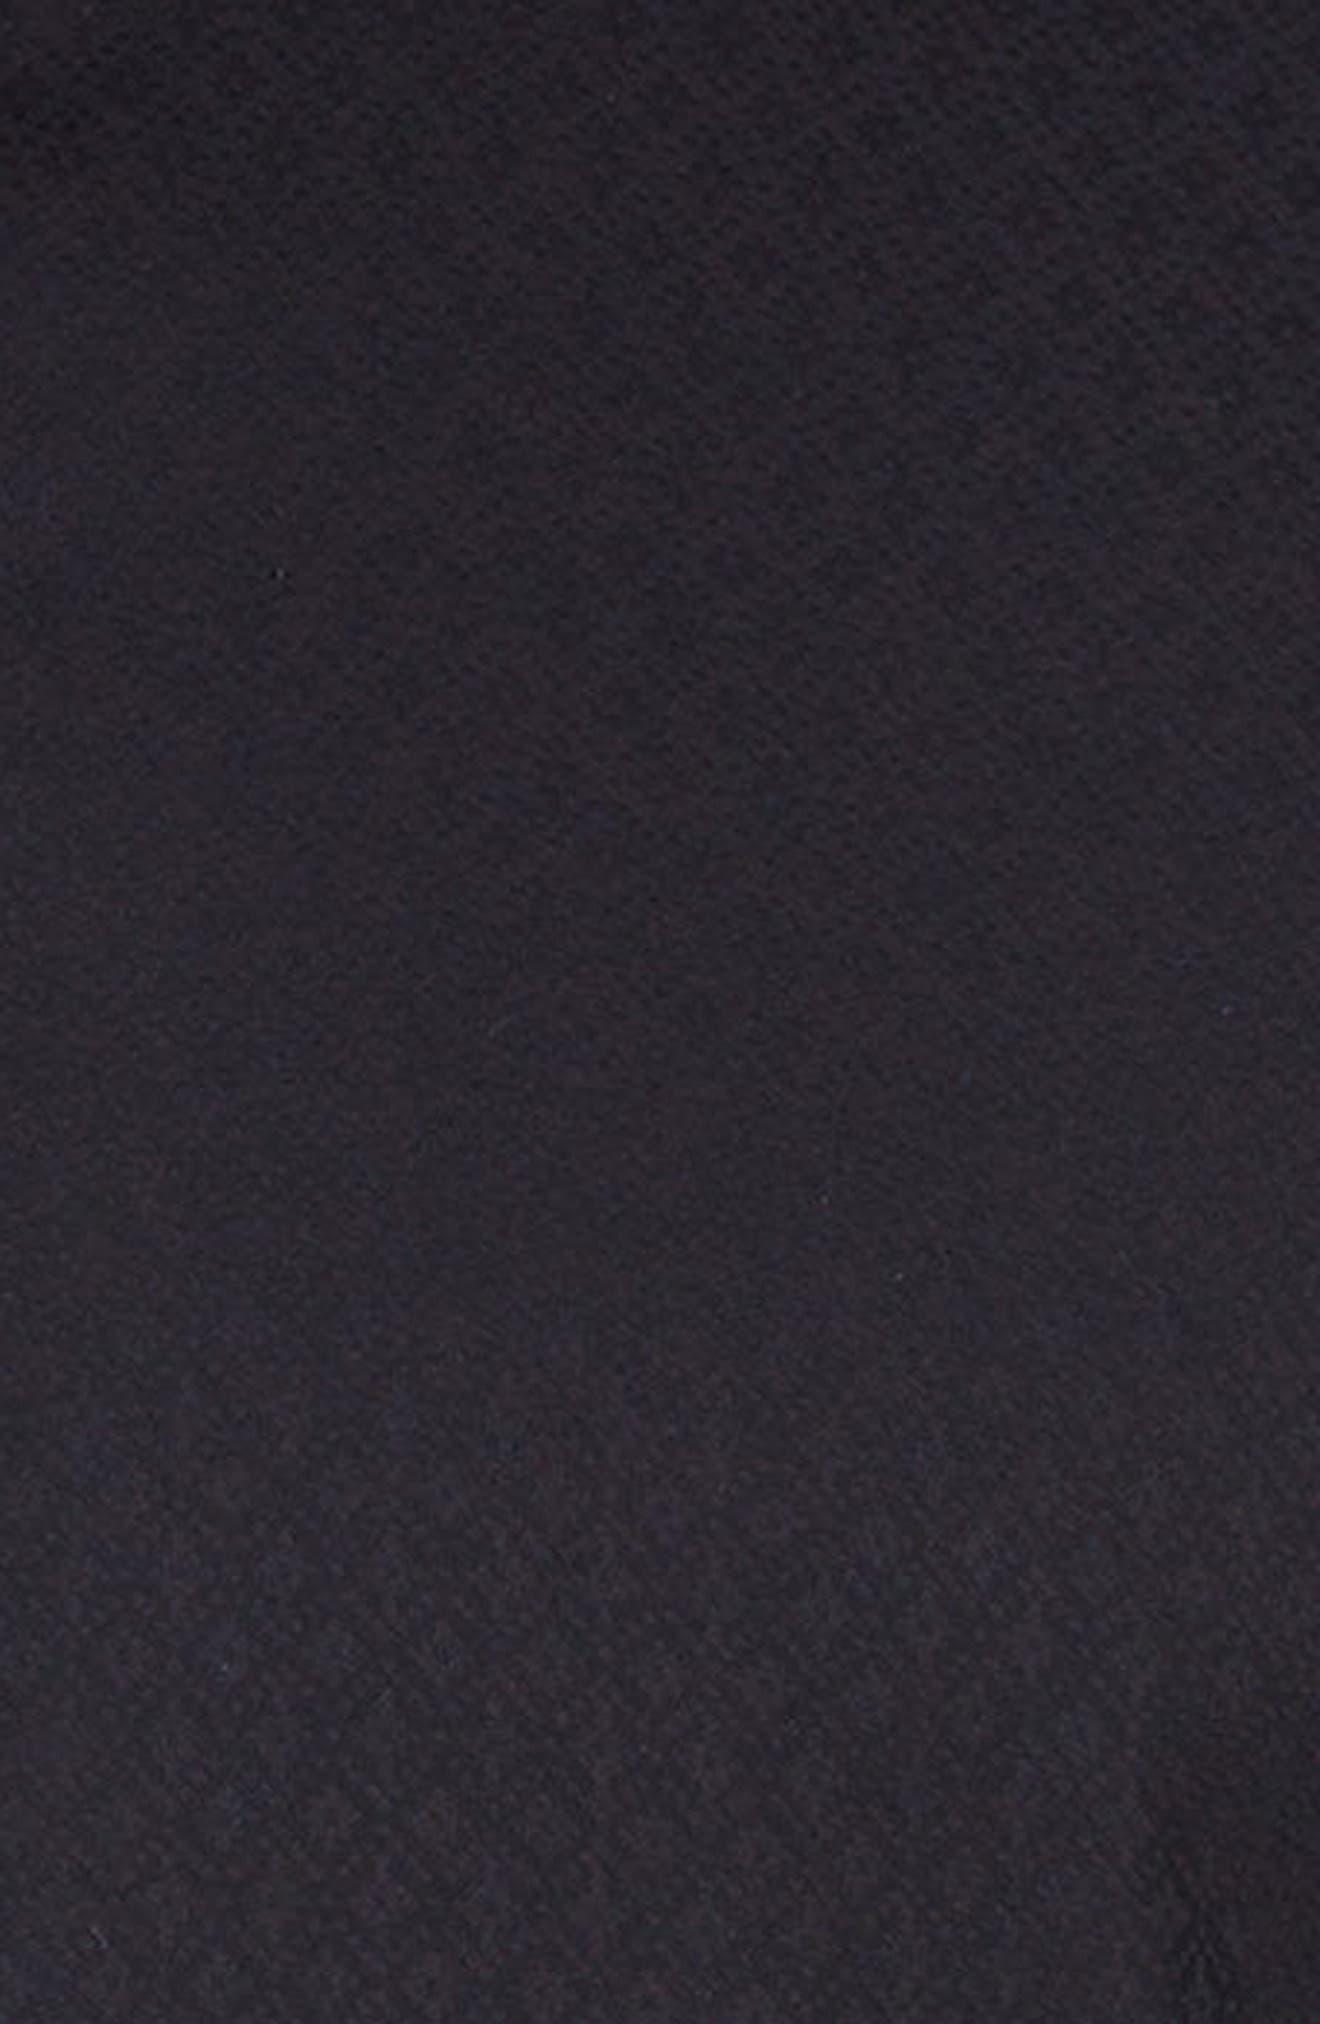 Classic Fit Sport Shirt,                             Alternate thumbnail 3, color,                             Black